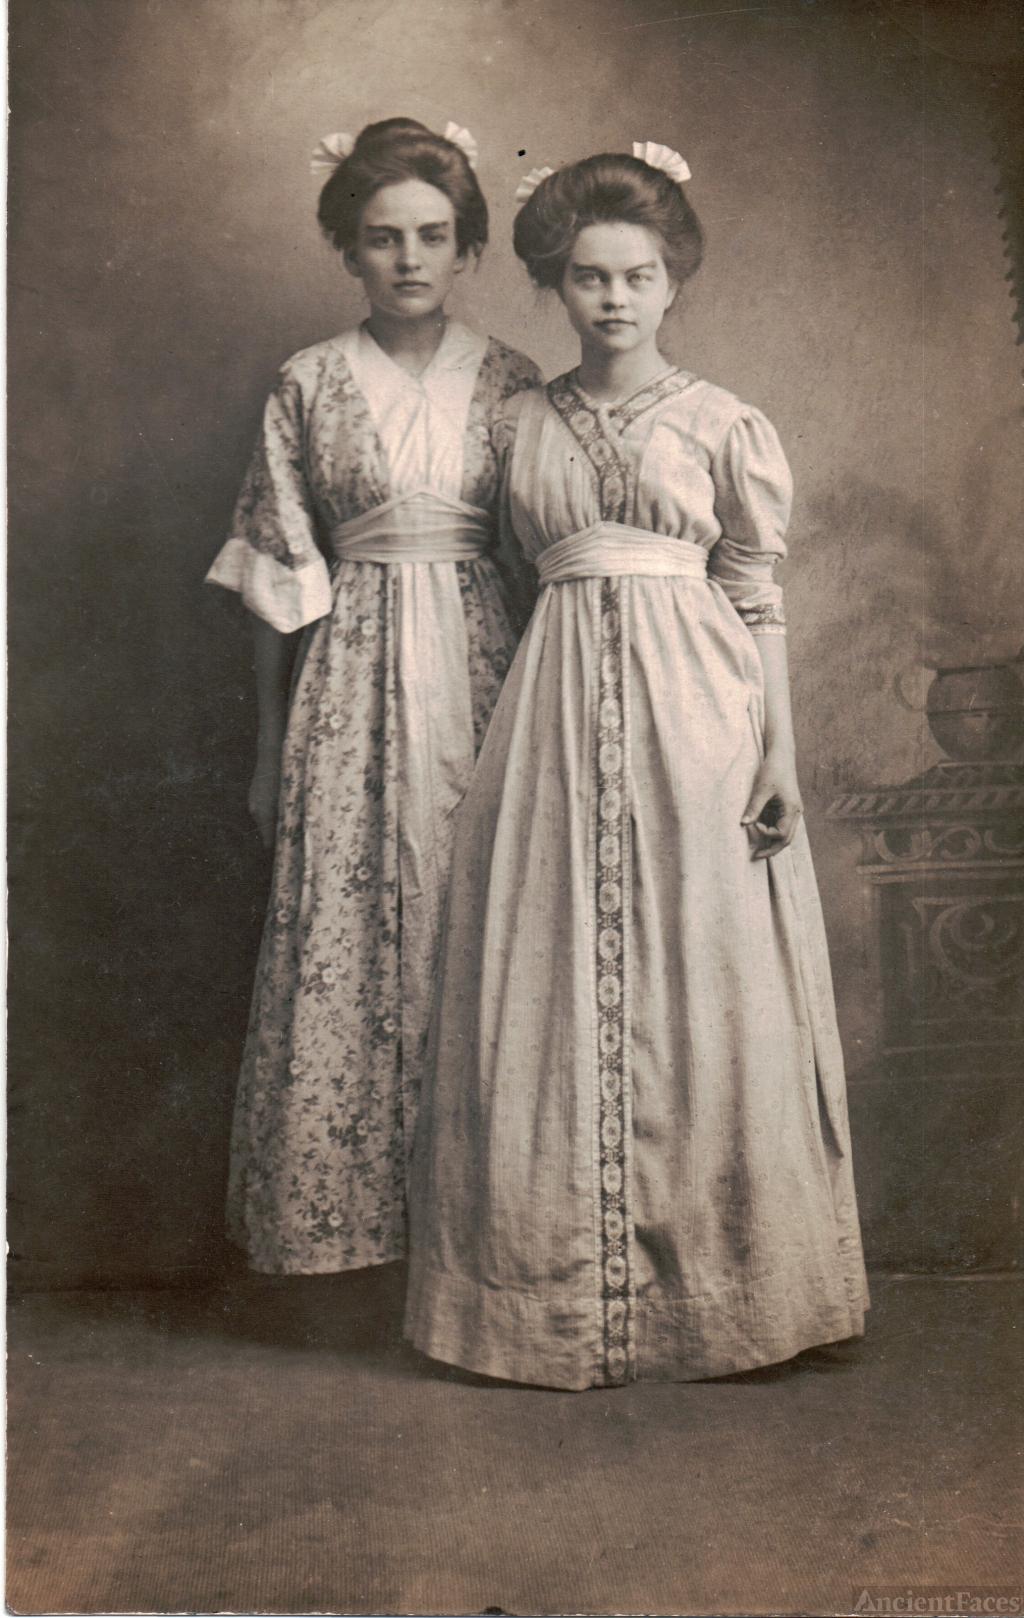 Hazel Vincent & Vern Burtleson, Oklahoma